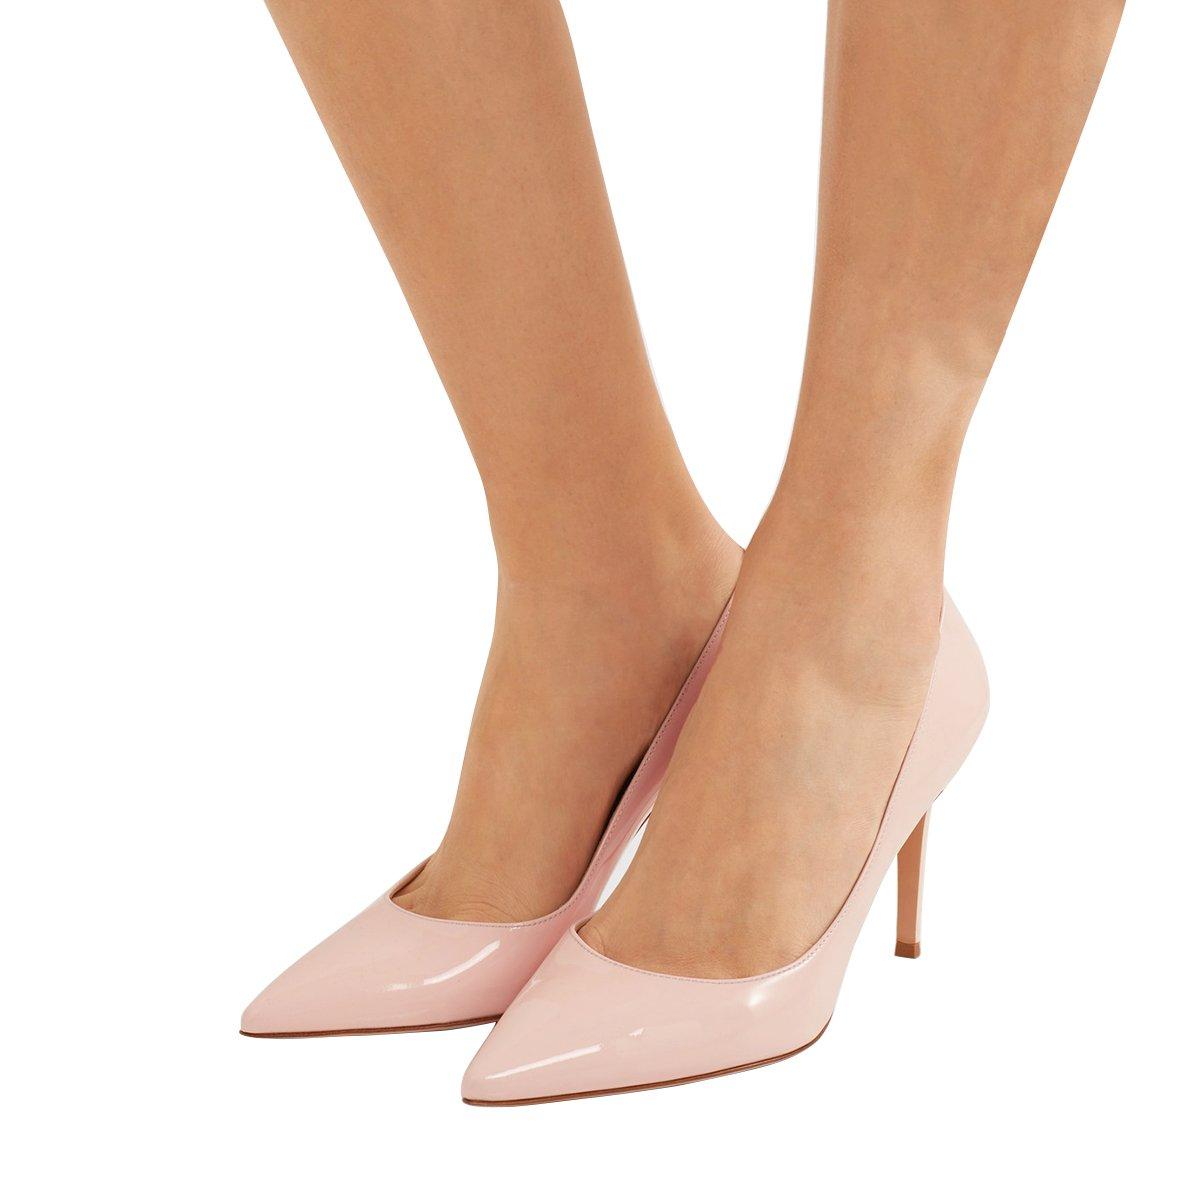 5d0a76668ed5b Amazon.com | FSJ Women Formal Pointy Toe Pumps Stiletto High Heels ...